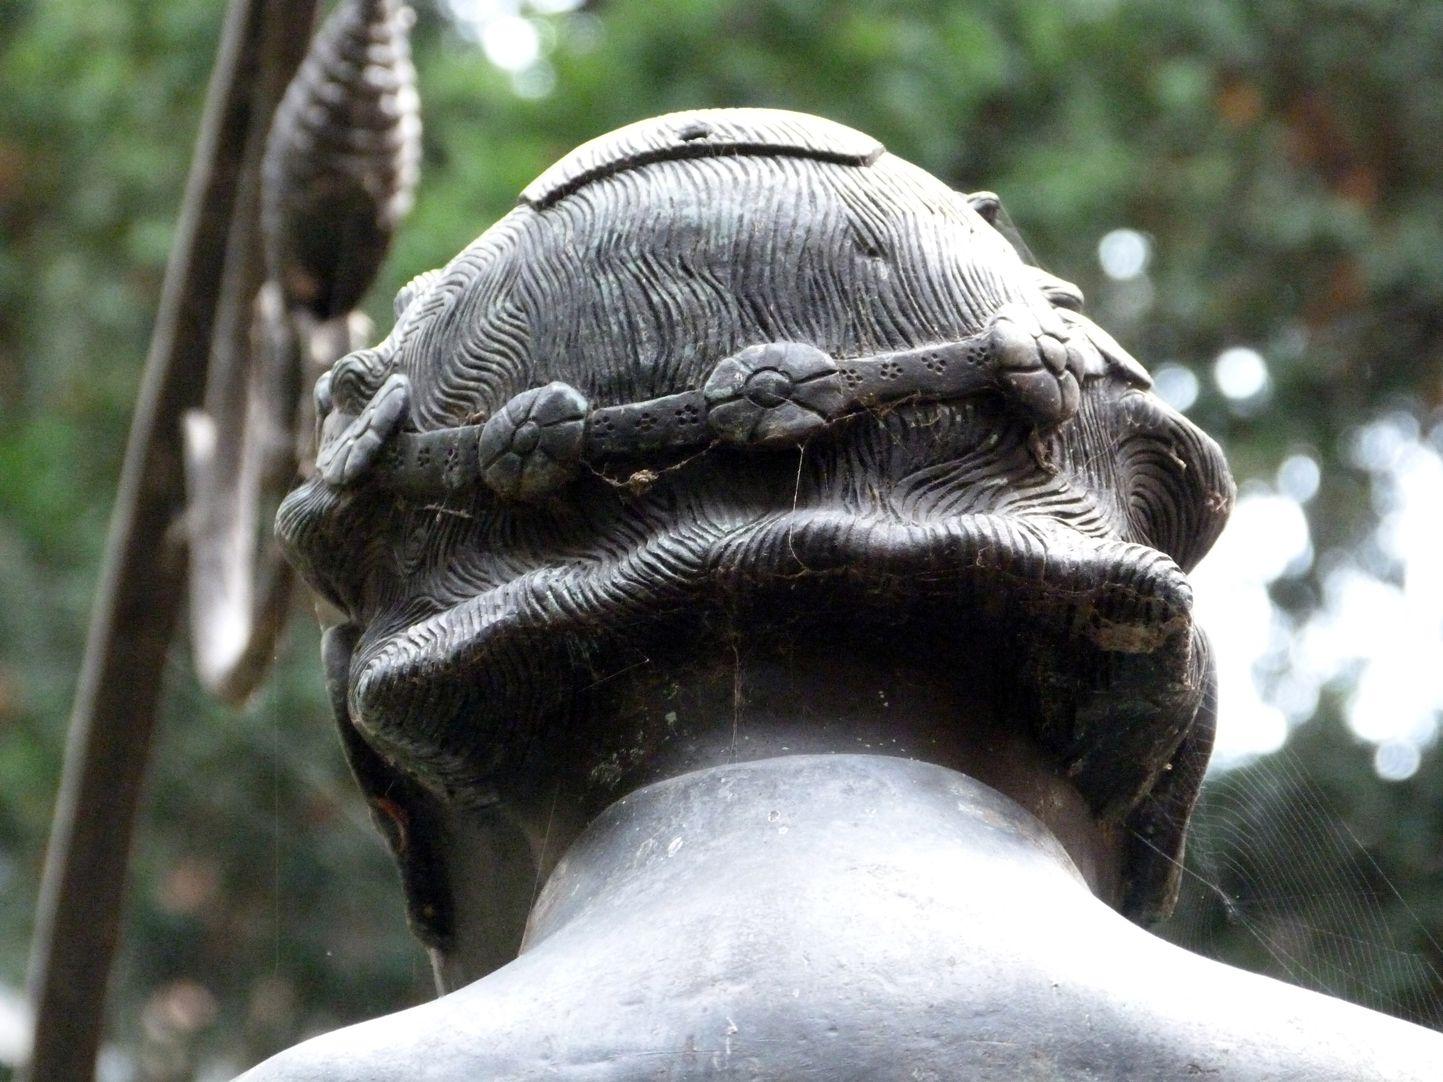 Hanselbrunnen Kopf von hinten